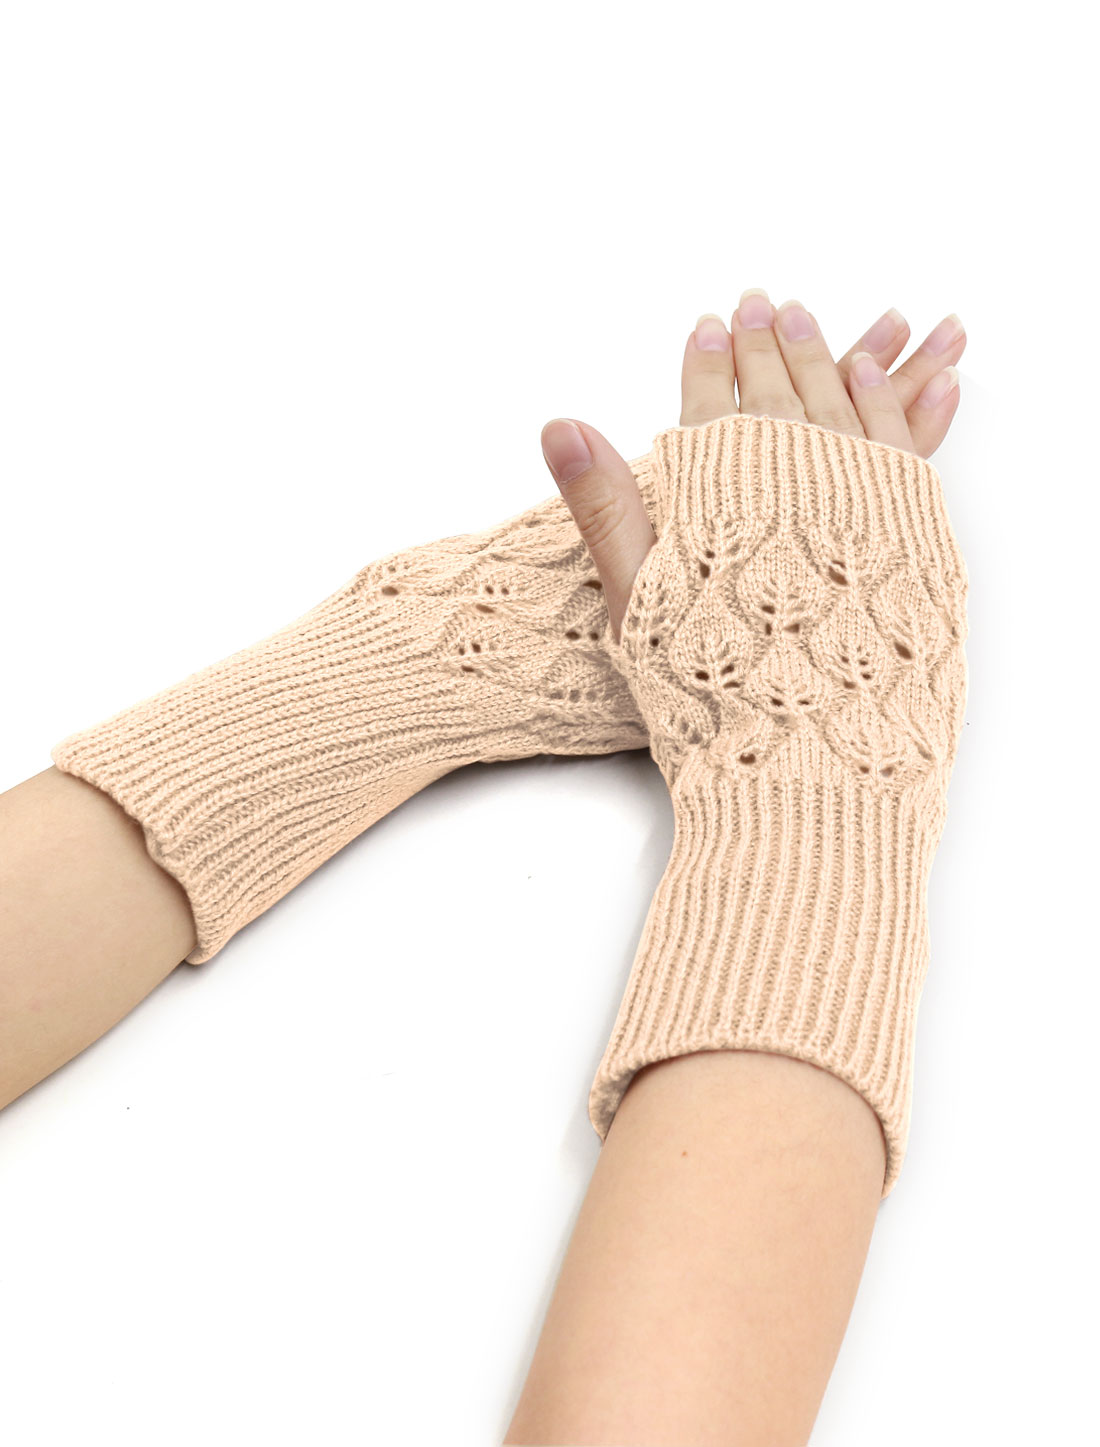 Women Wrist Length Leaves Design Knit Arm Warmers Pair Beige